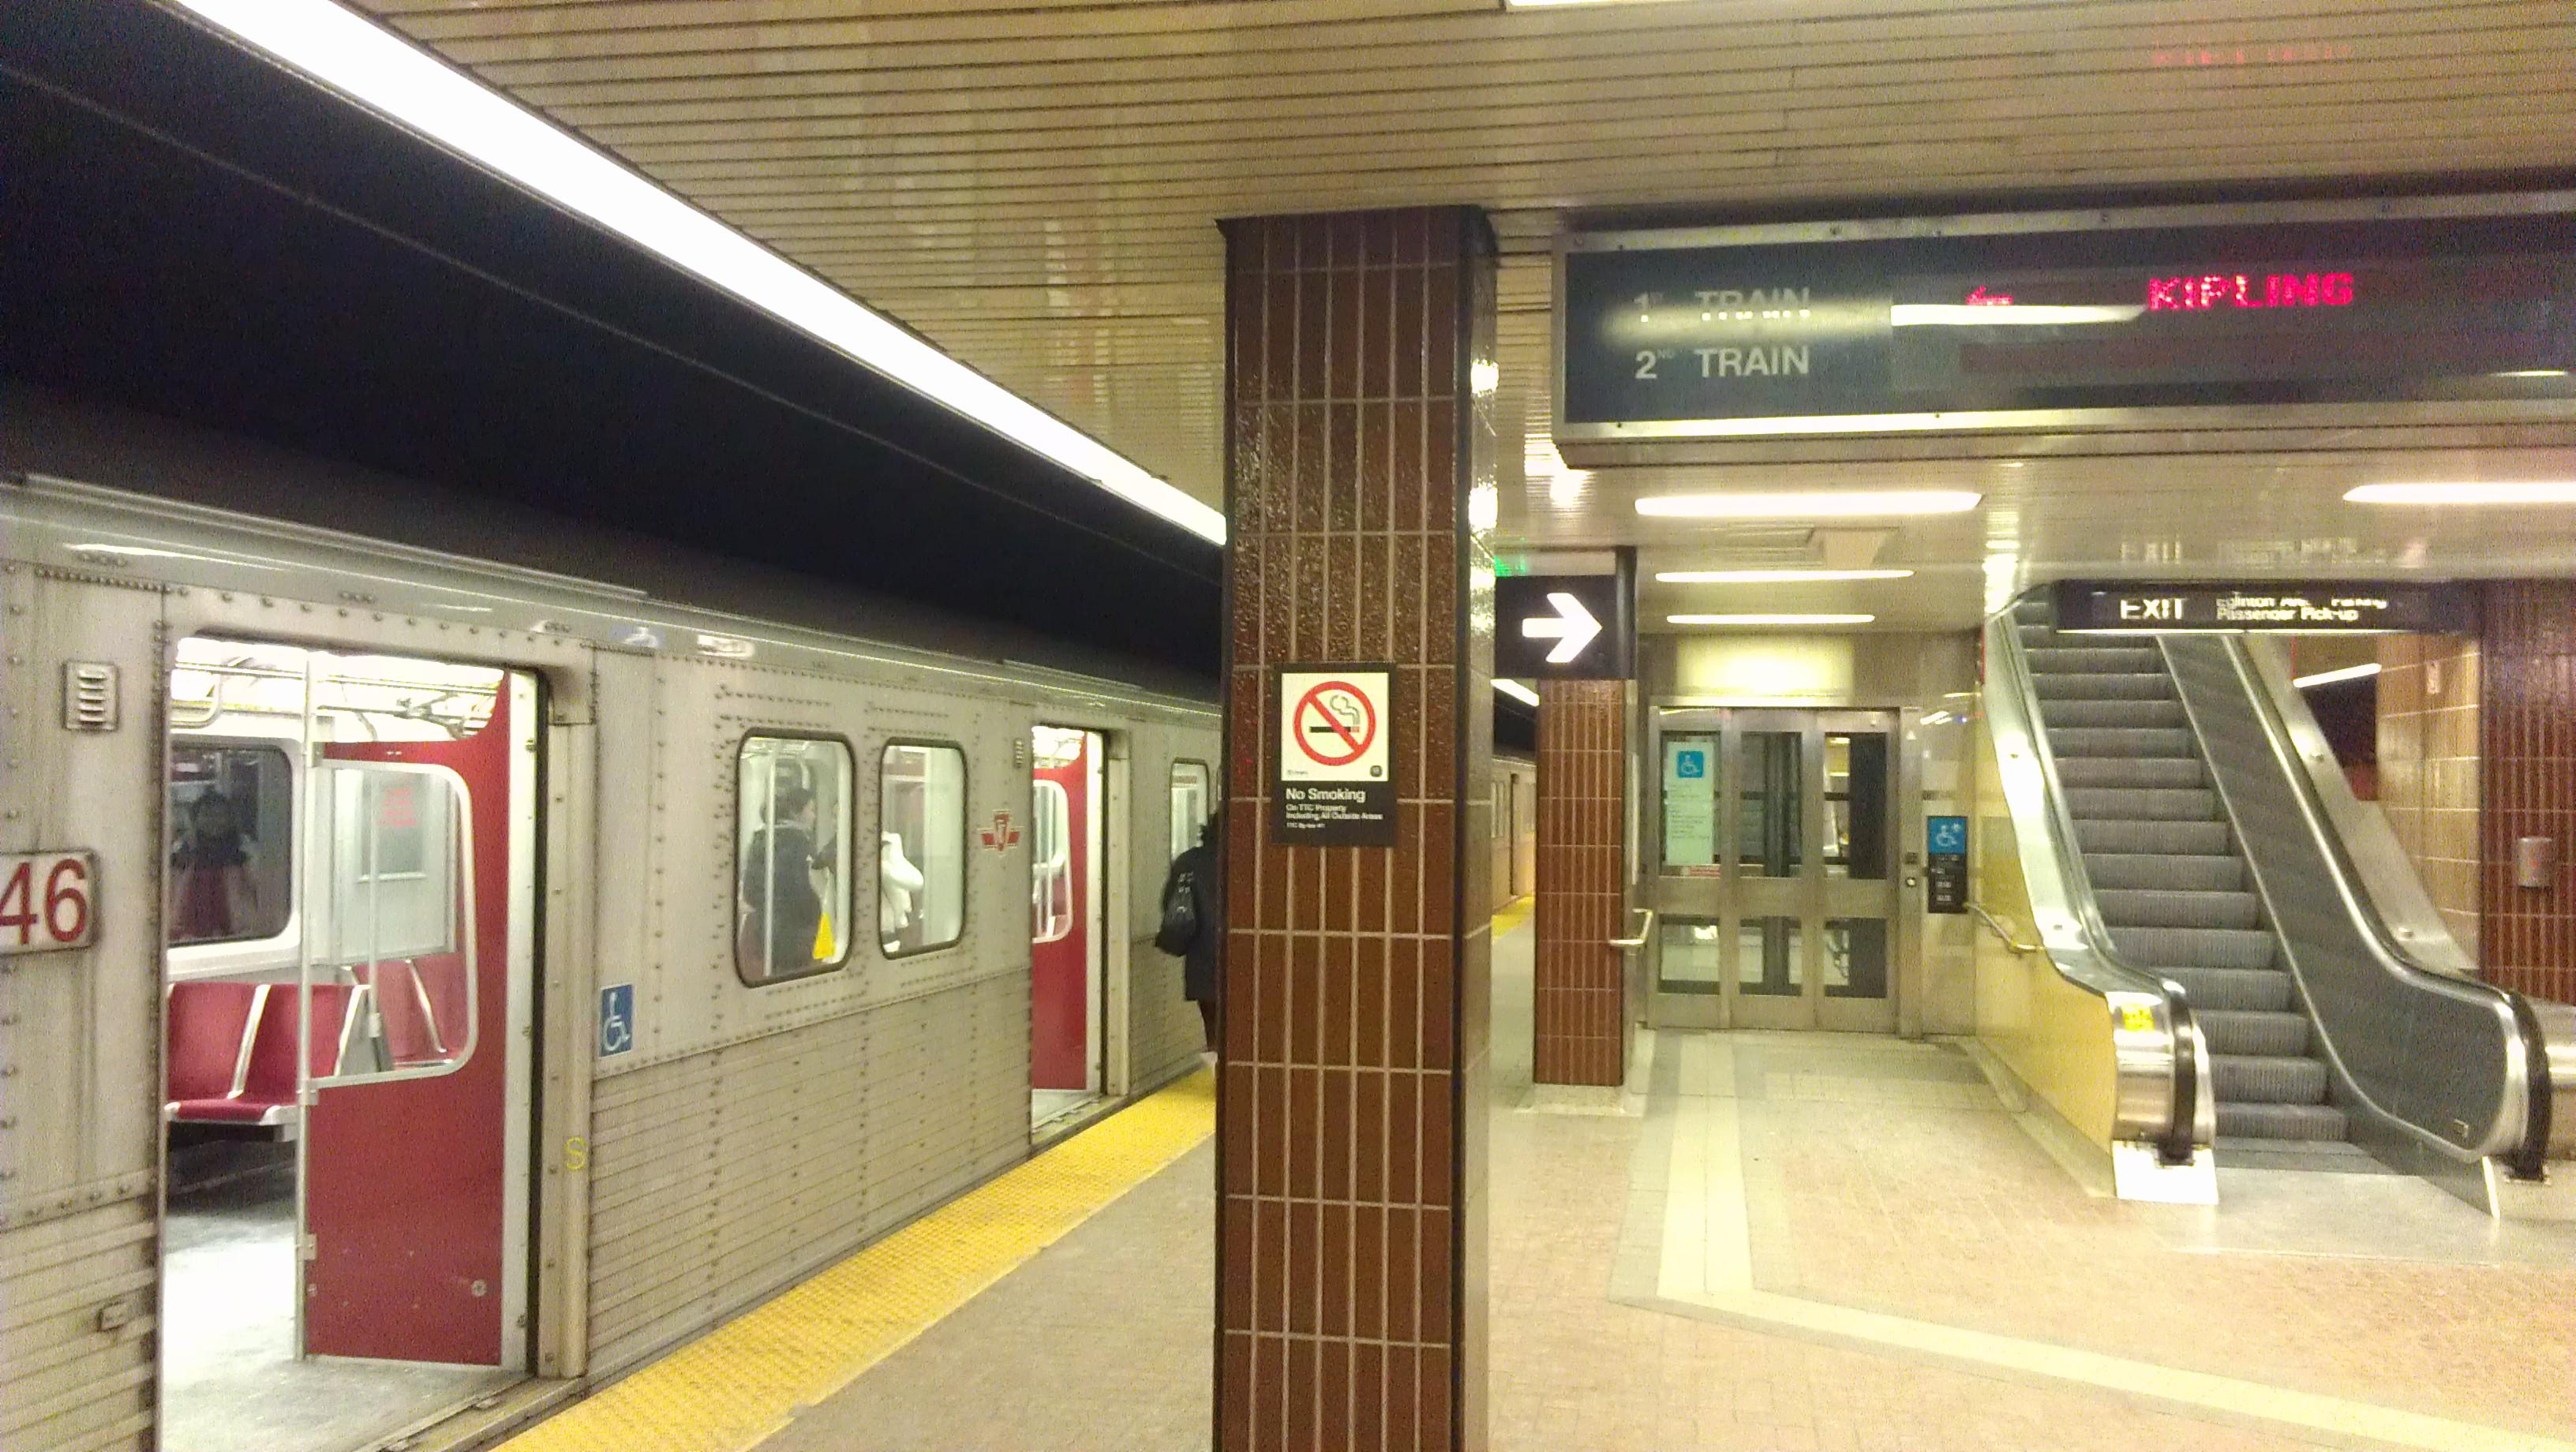 File:Kennedy TTC subway platform.jpg - Wikimedia Commons